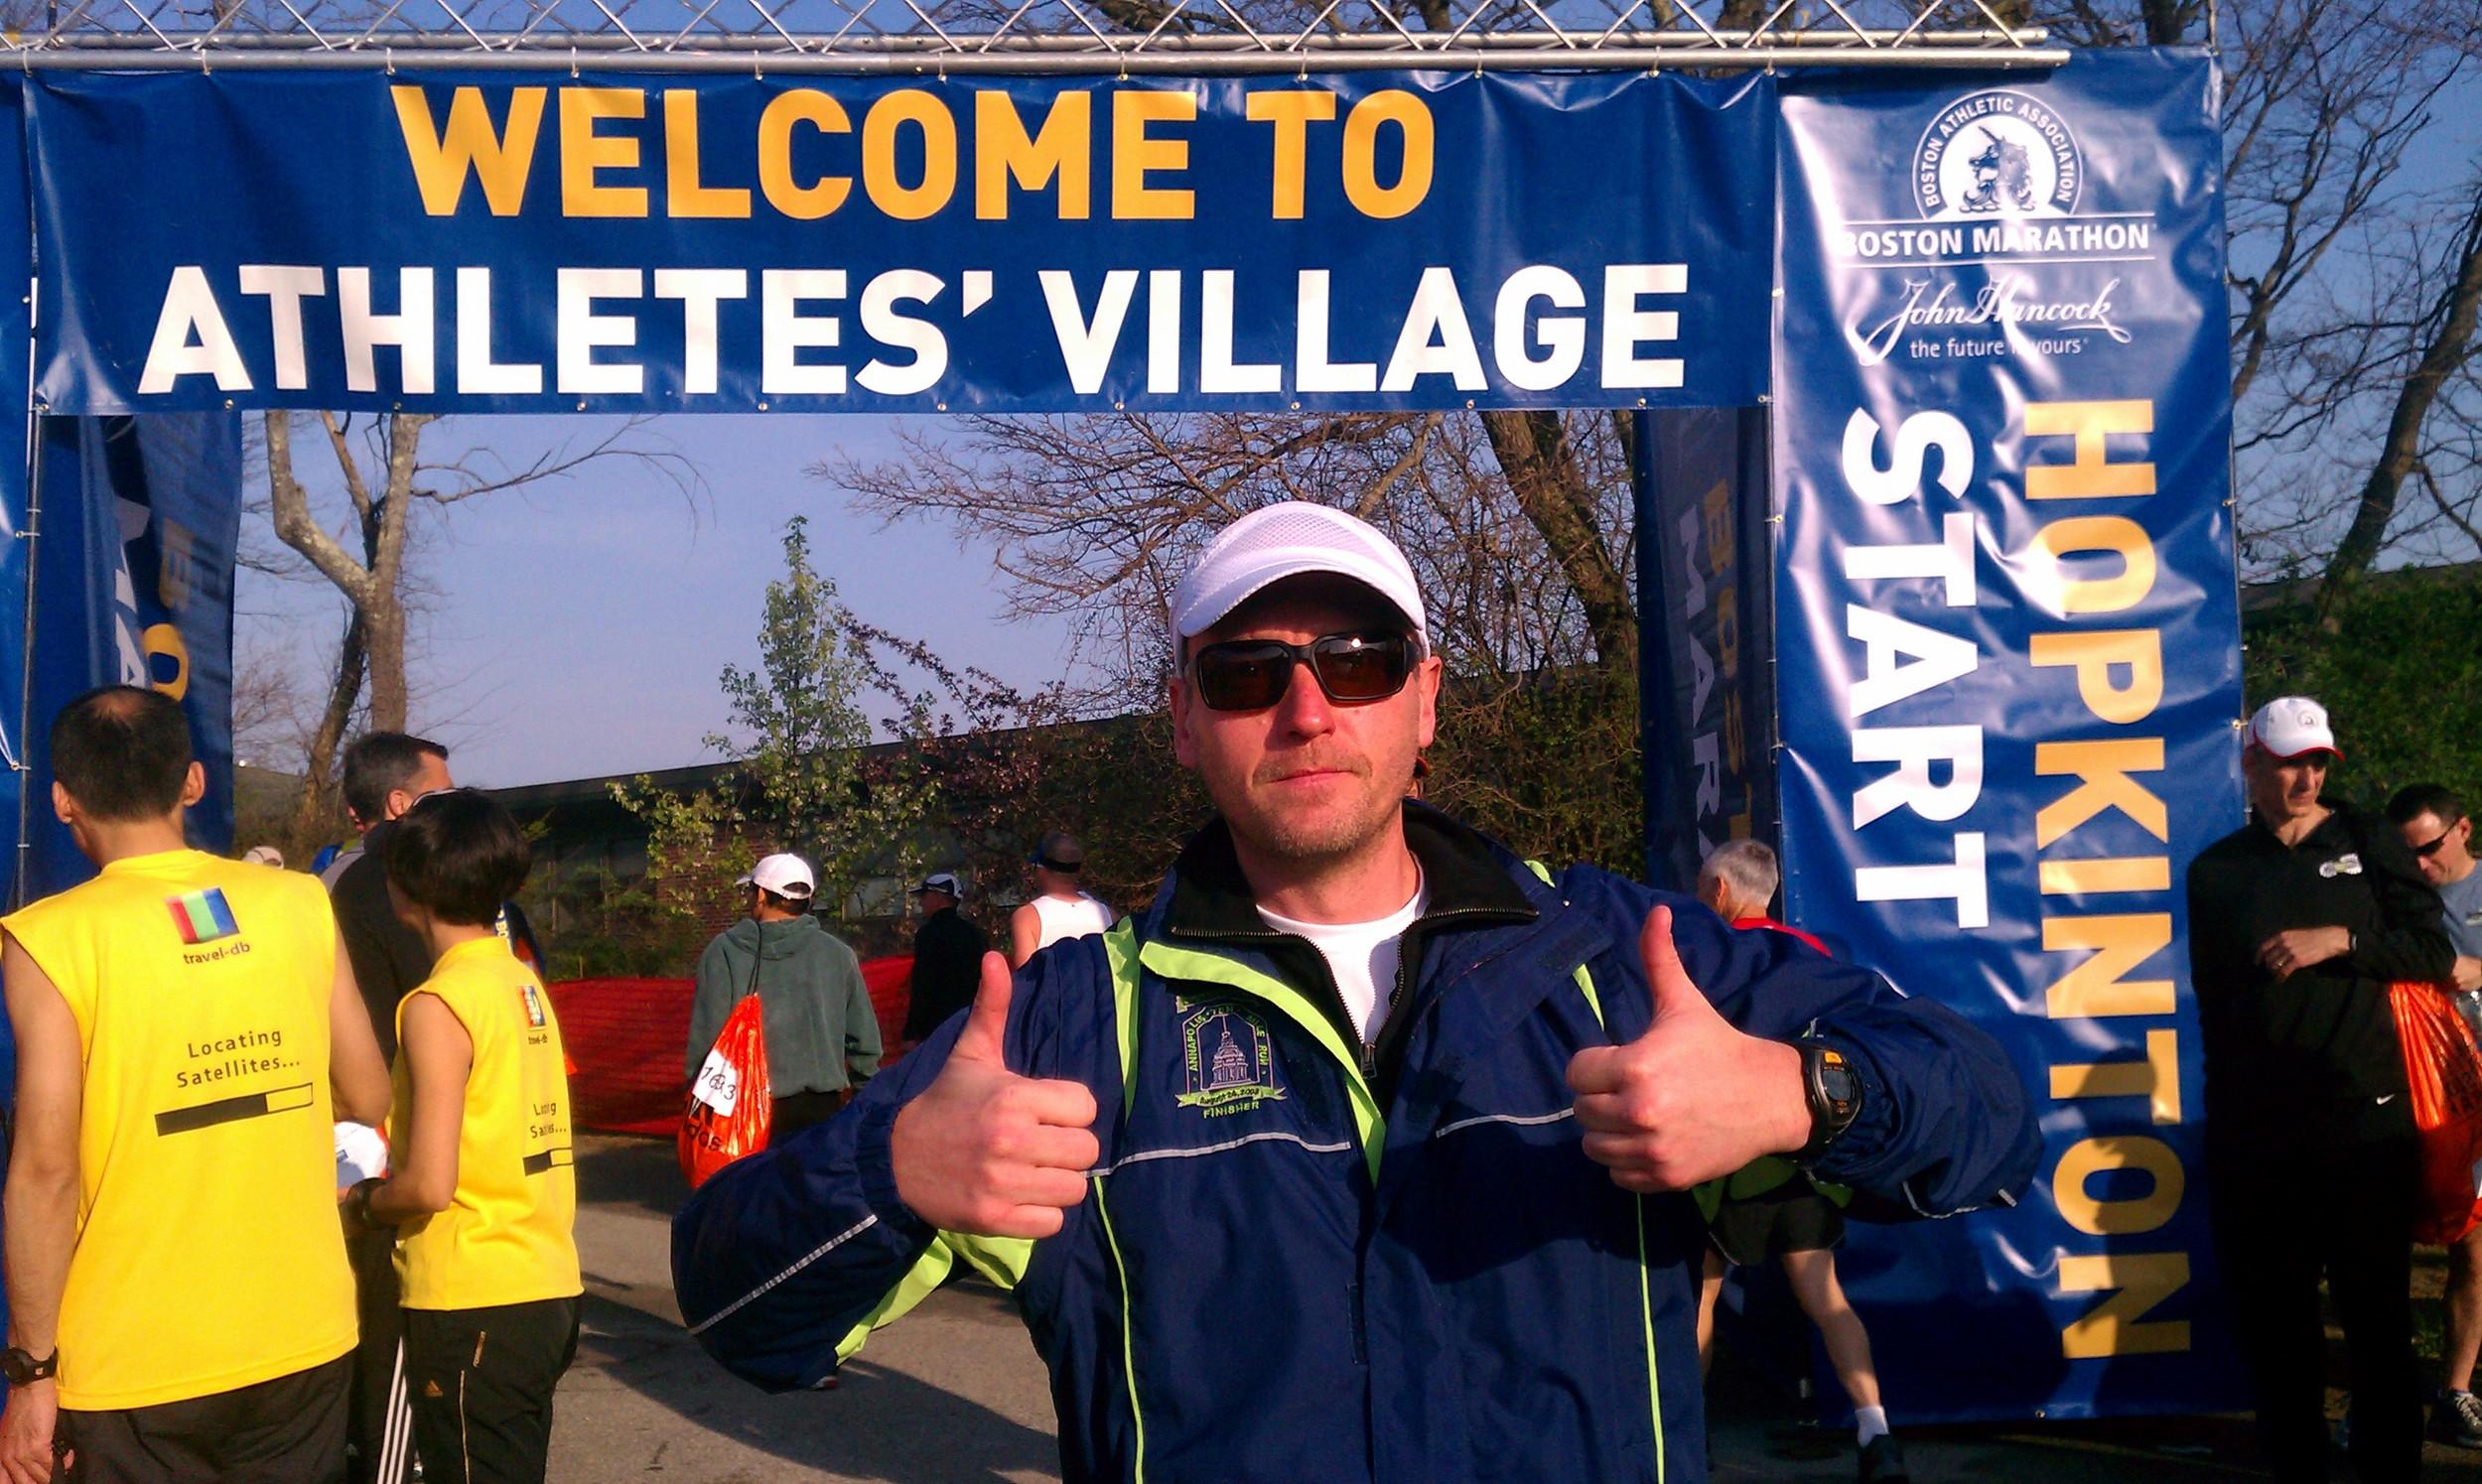 pierce-mcmanus-boston-marathon-start.jpg